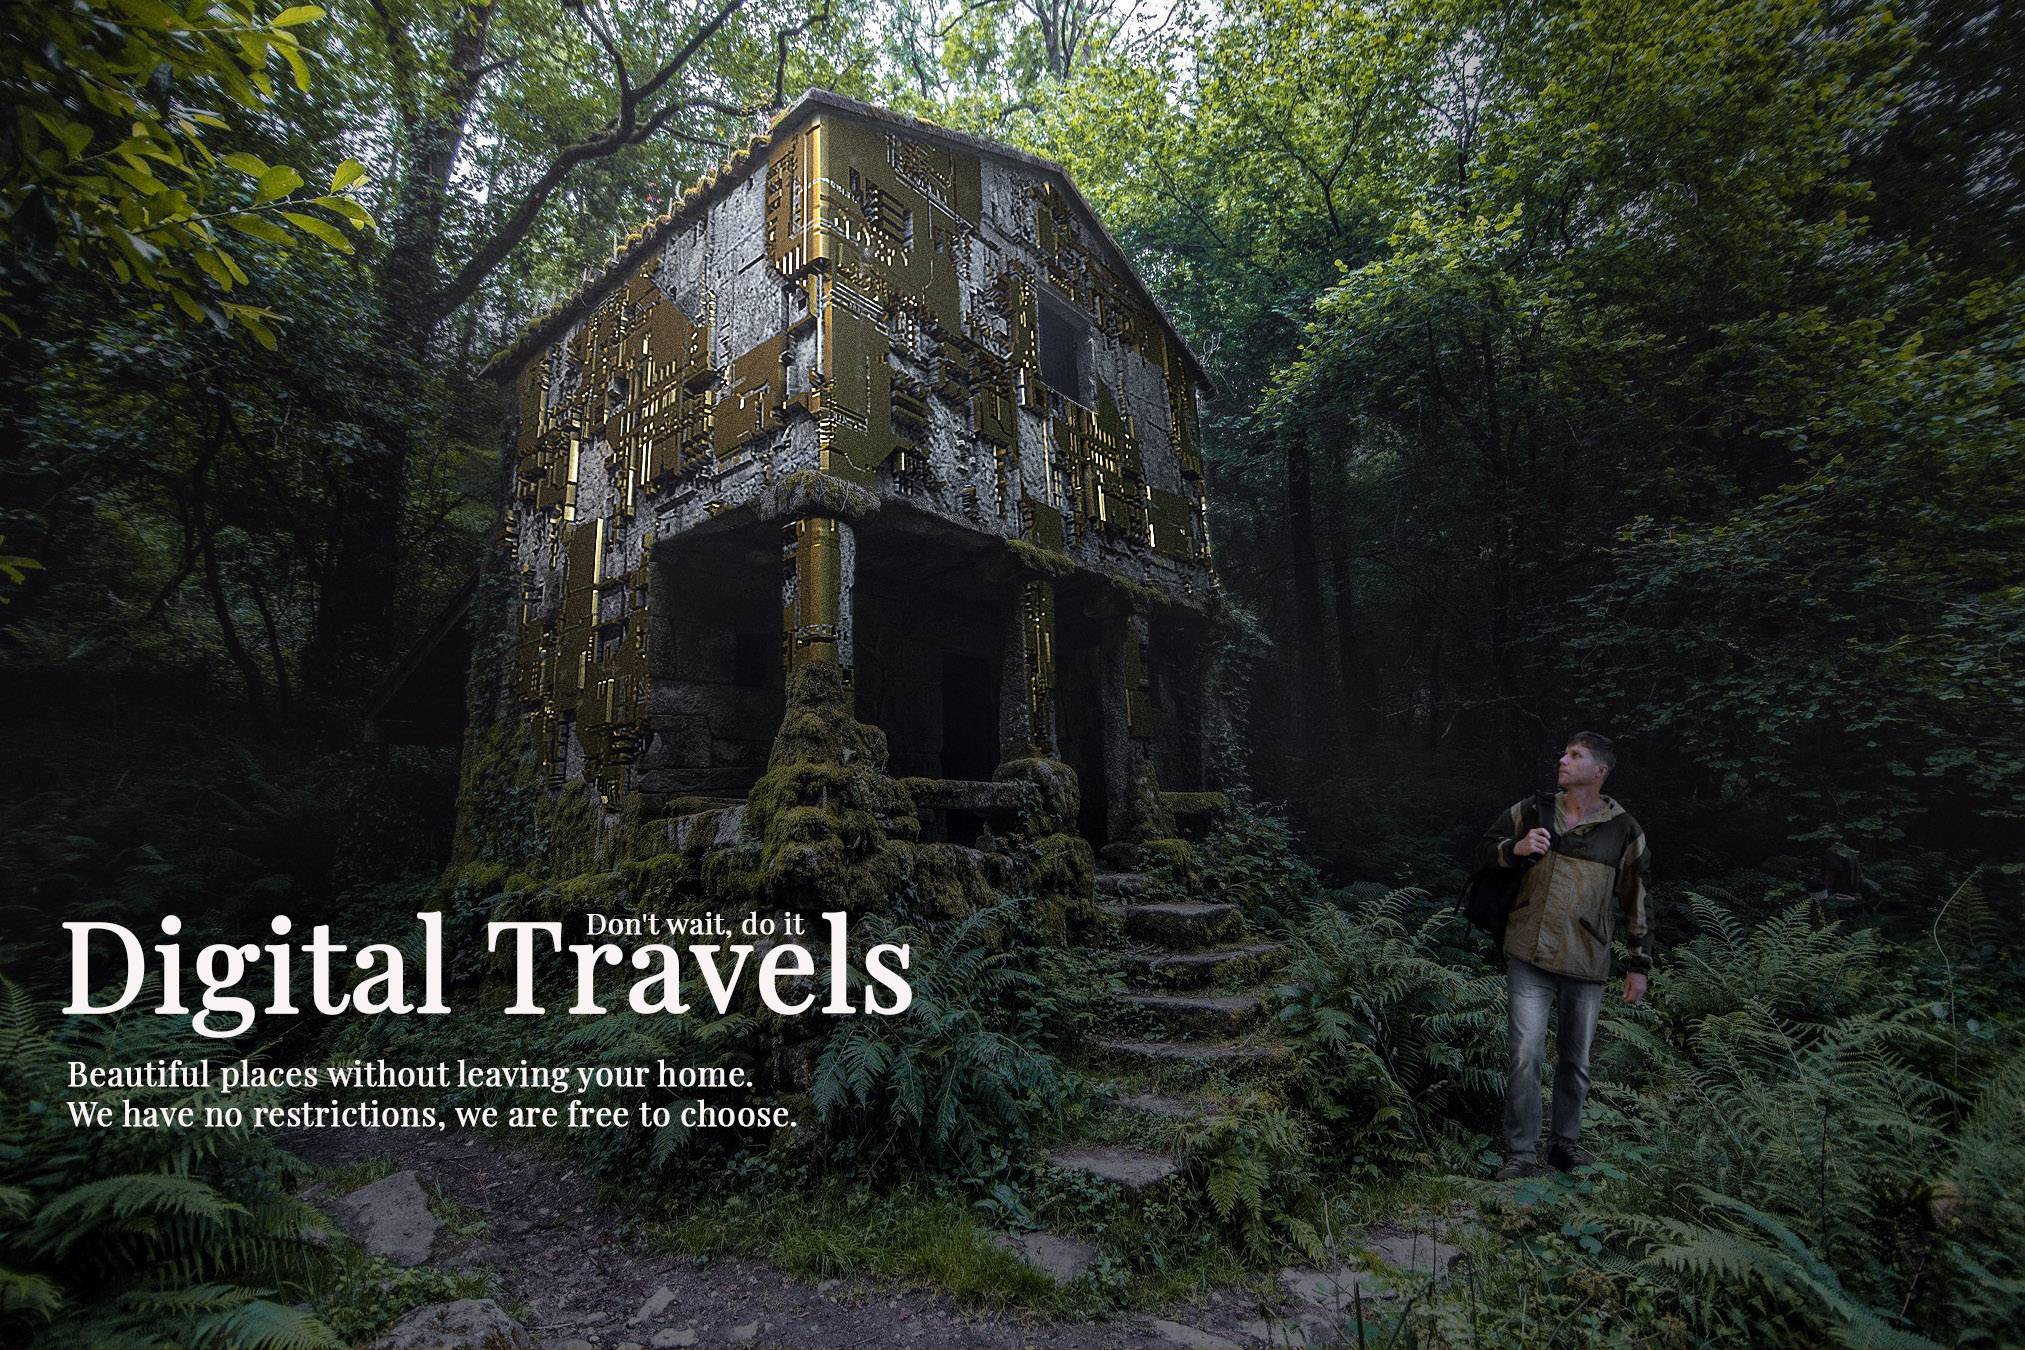 Digital Travels